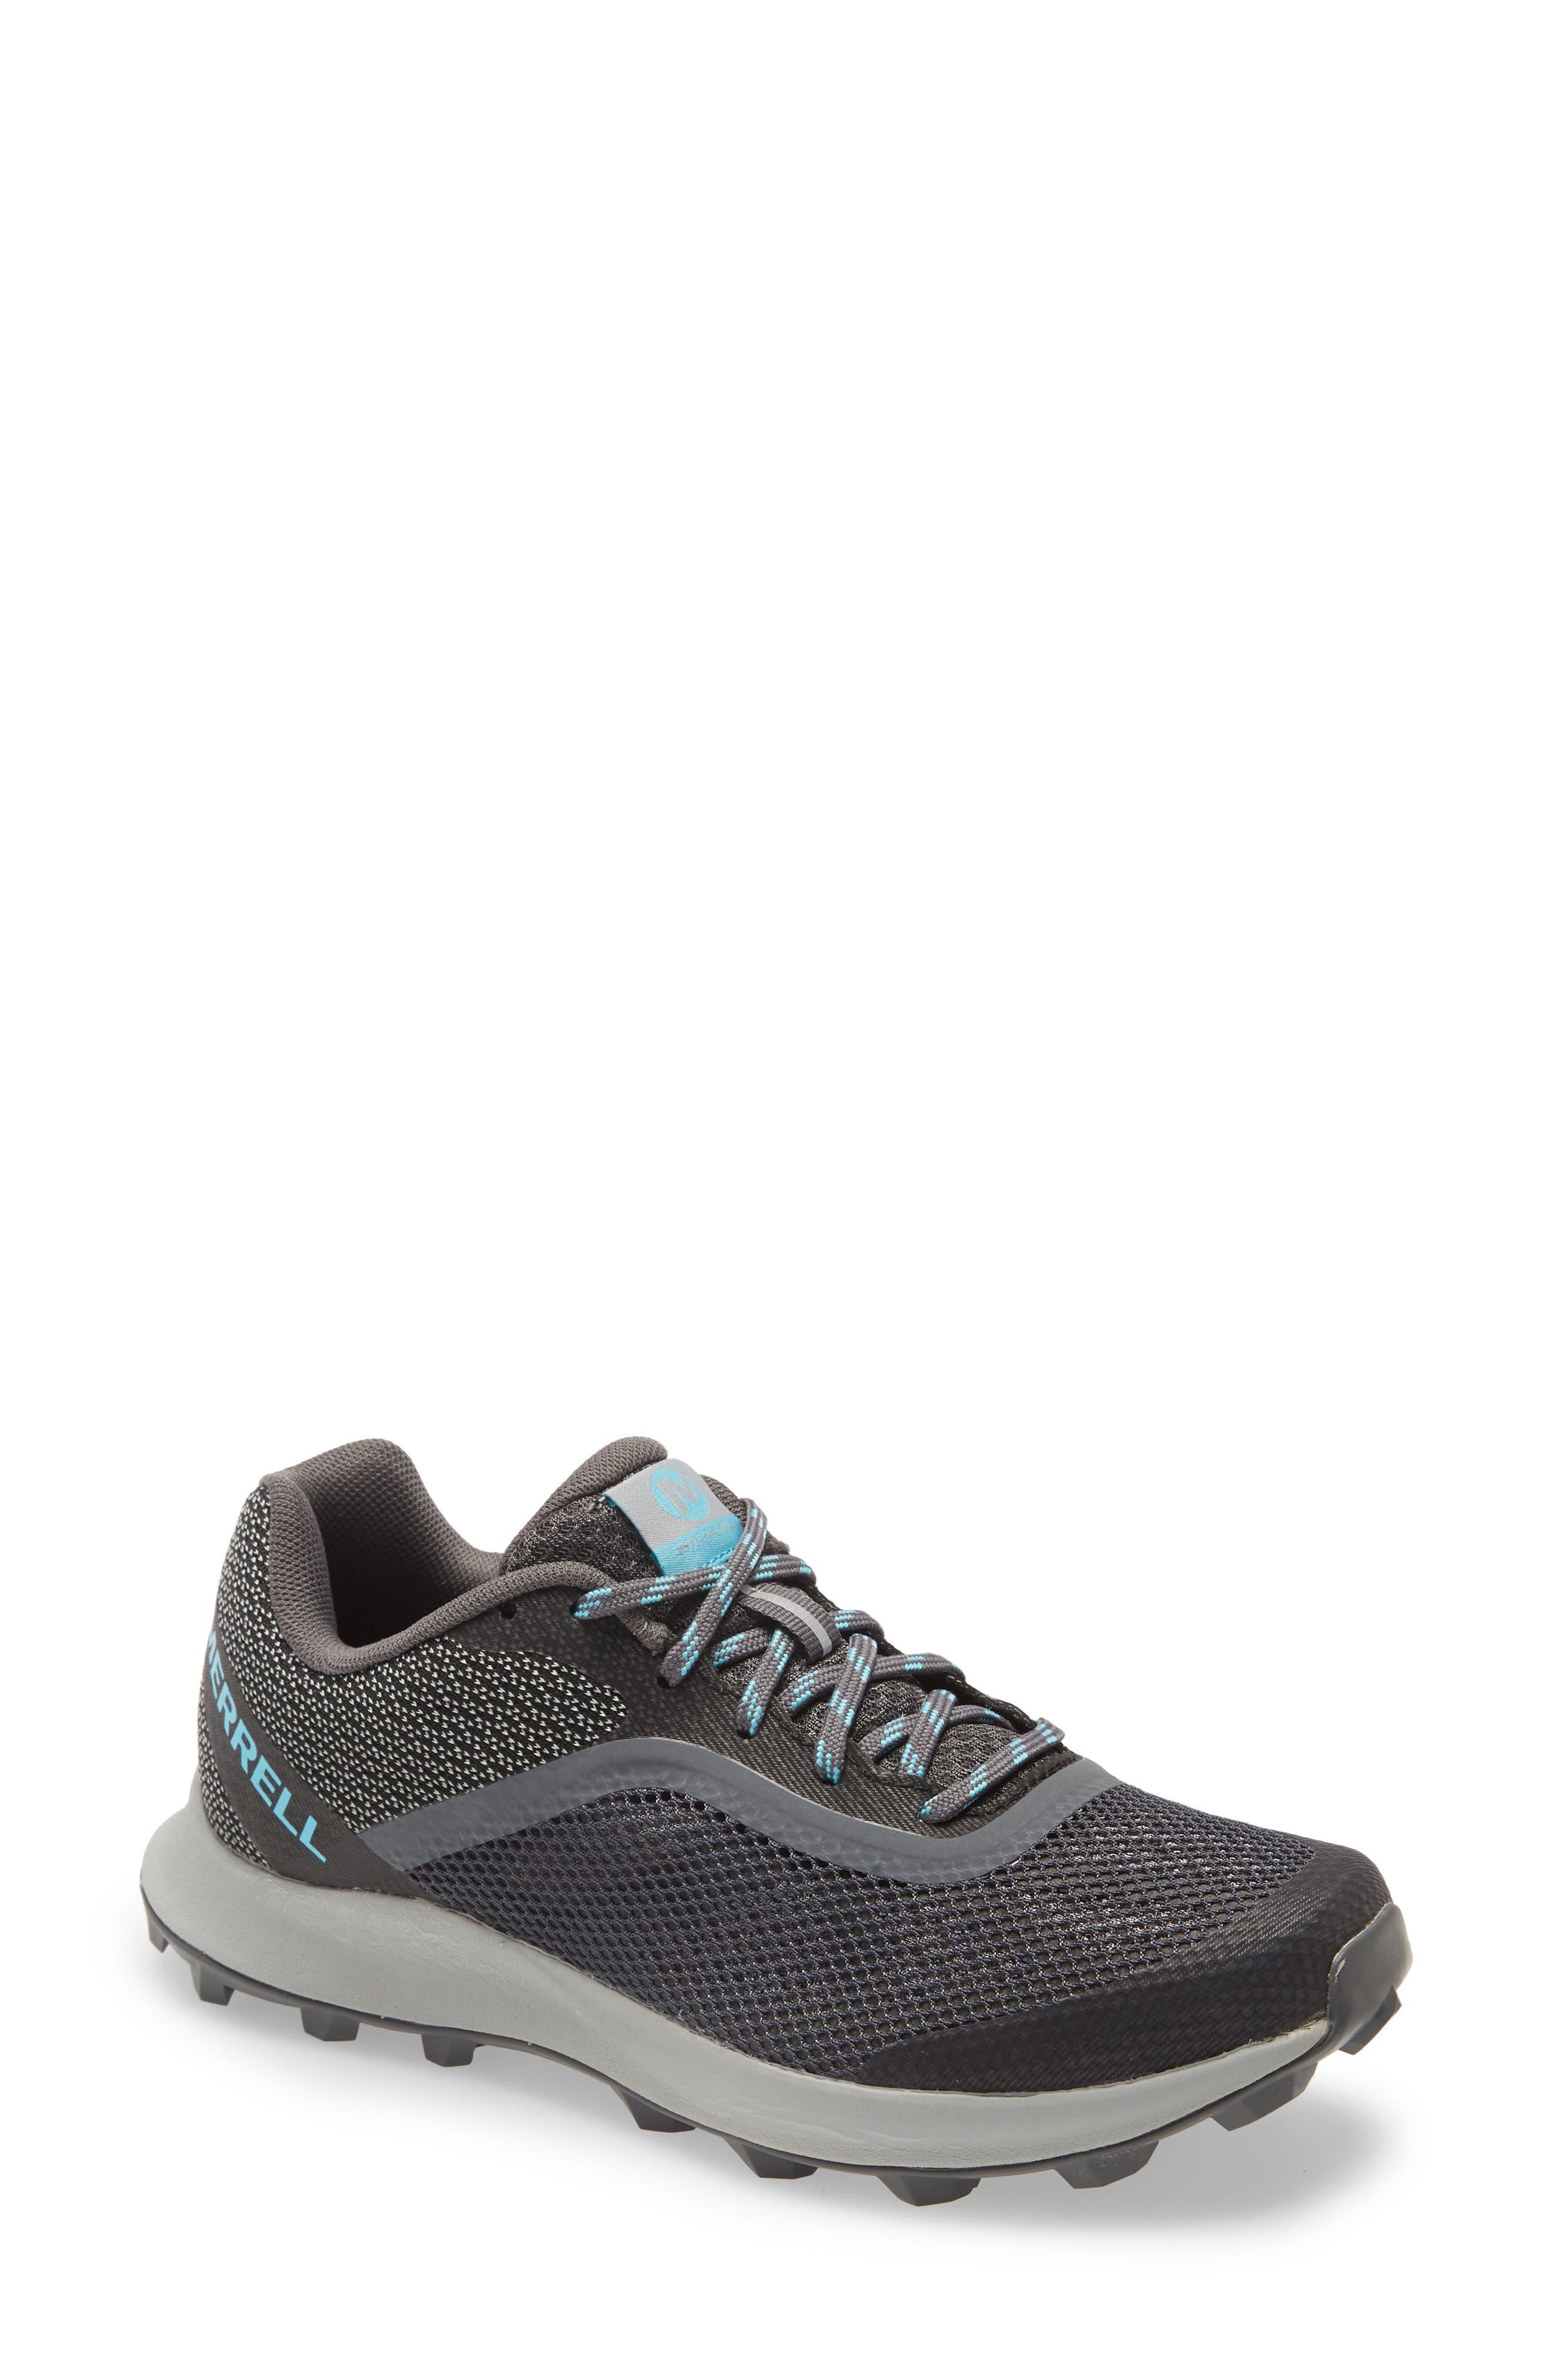 Mtl Skyfire Trail Running Shoe